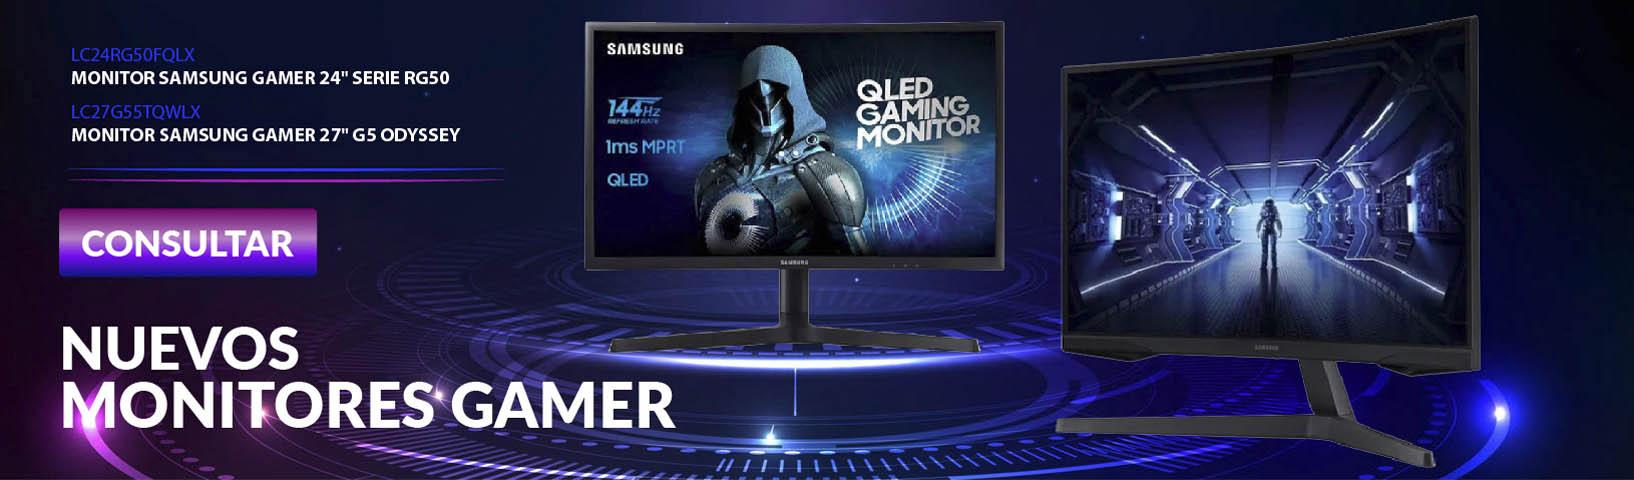 banner-monitoresgamer-top.jpg